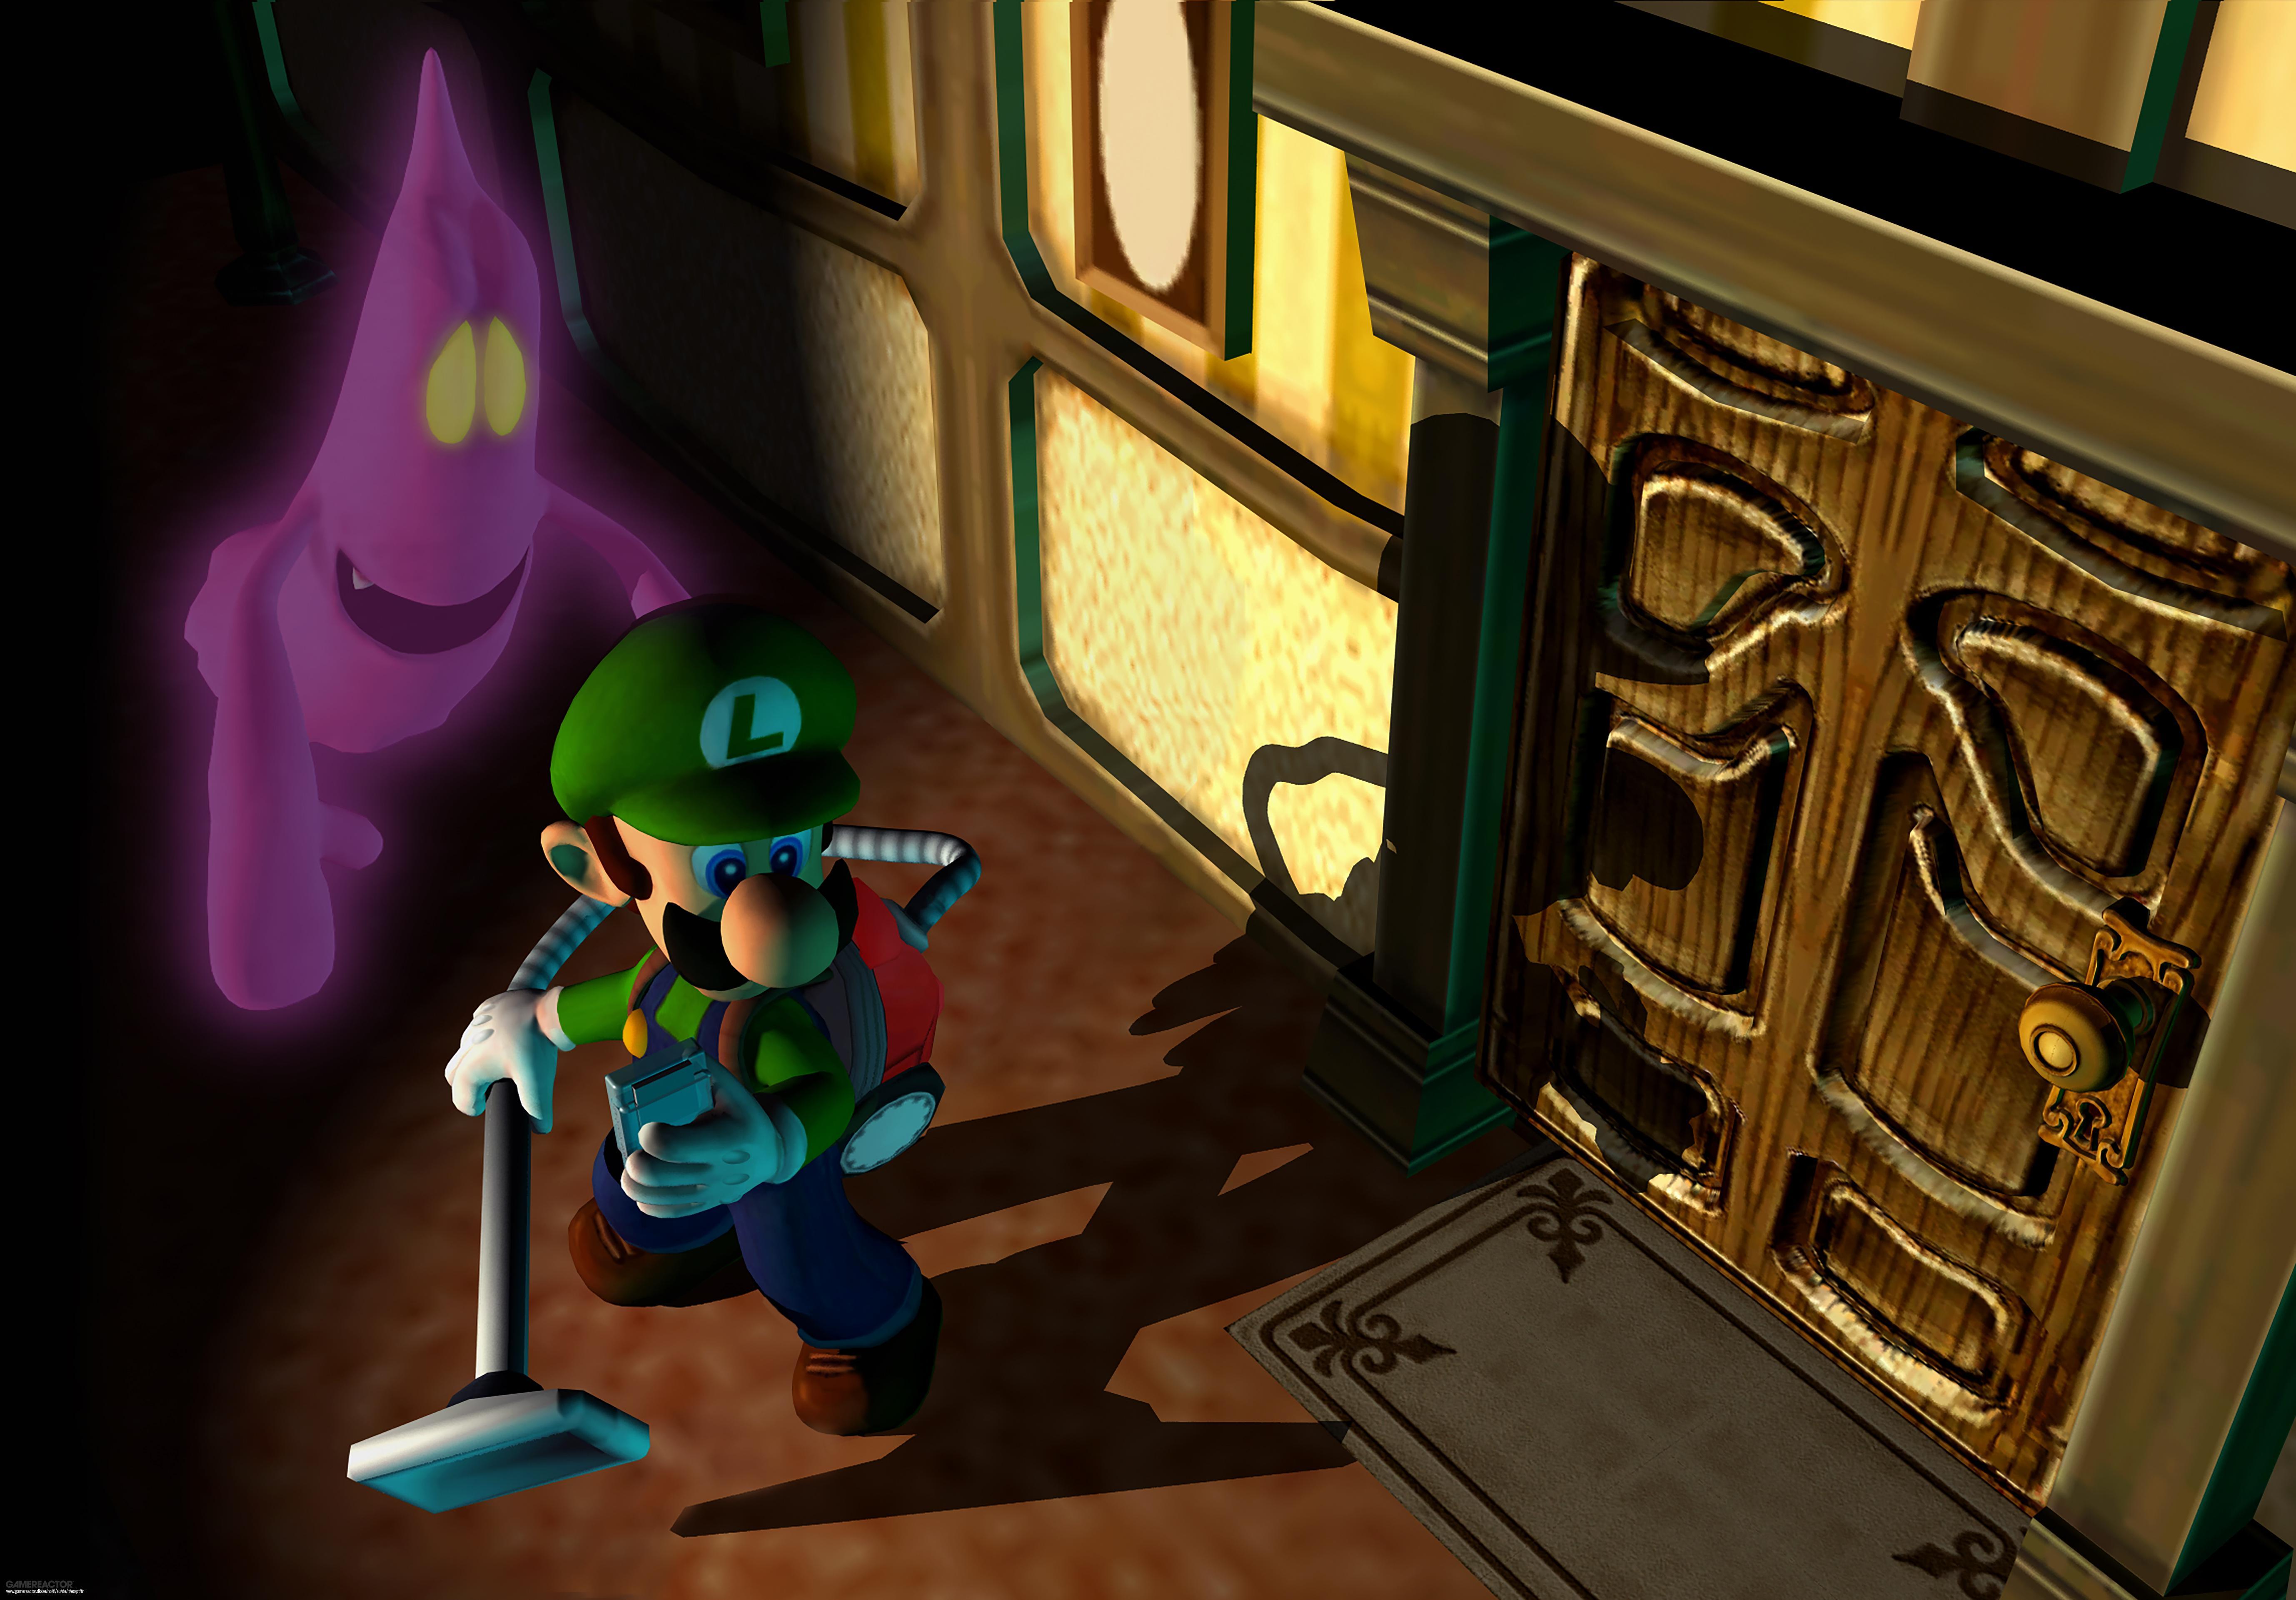 Luigi S Mansion 3ds : Original luigi s mansion gets remake on ds